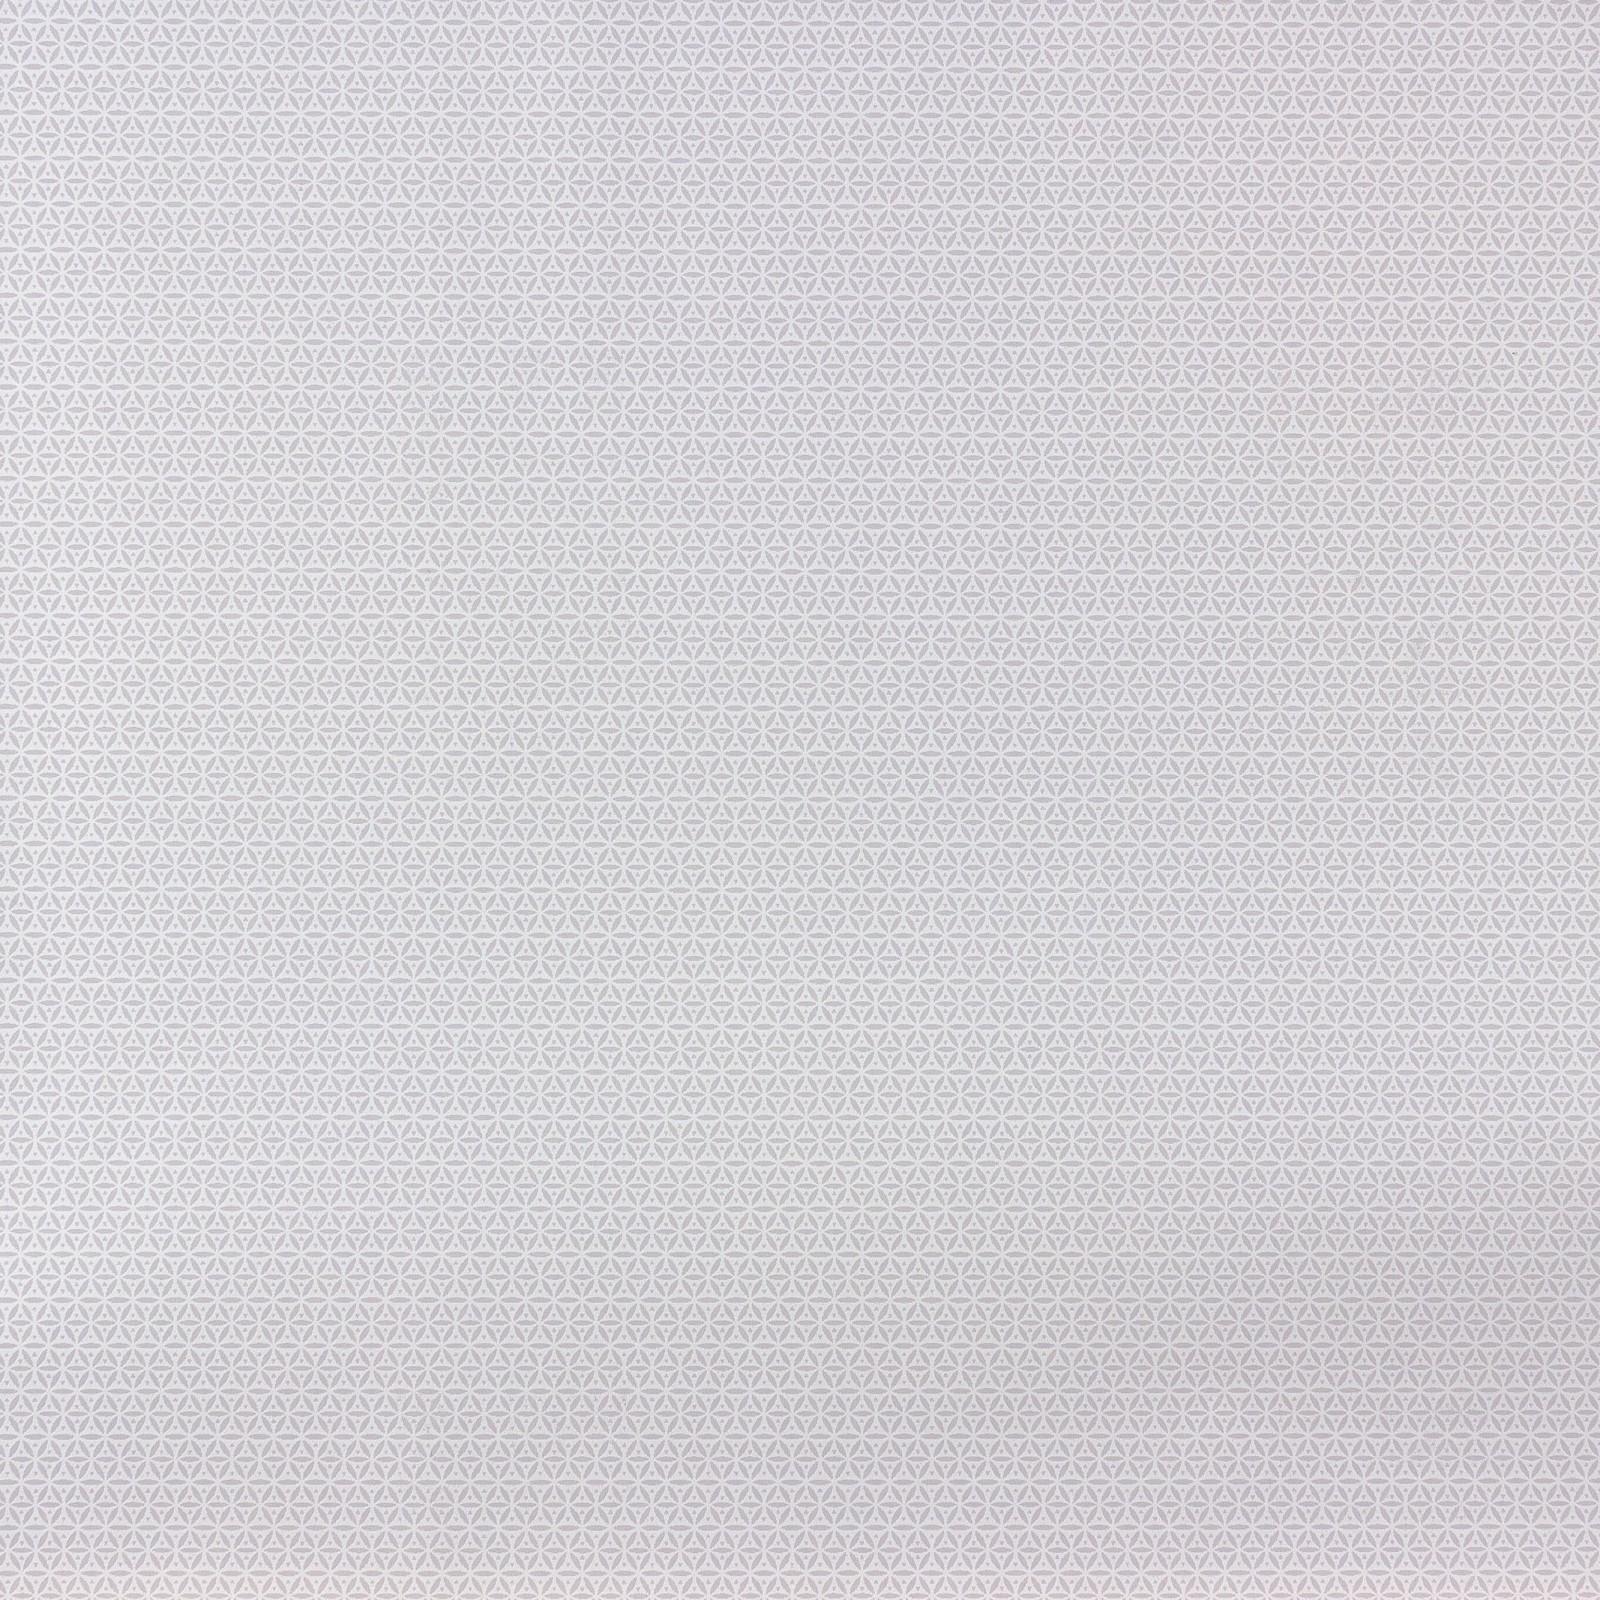 tapeten marburg 4 women walls vliestapete 54056 design uni. Black Bedroom Furniture Sets. Home Design Ideas